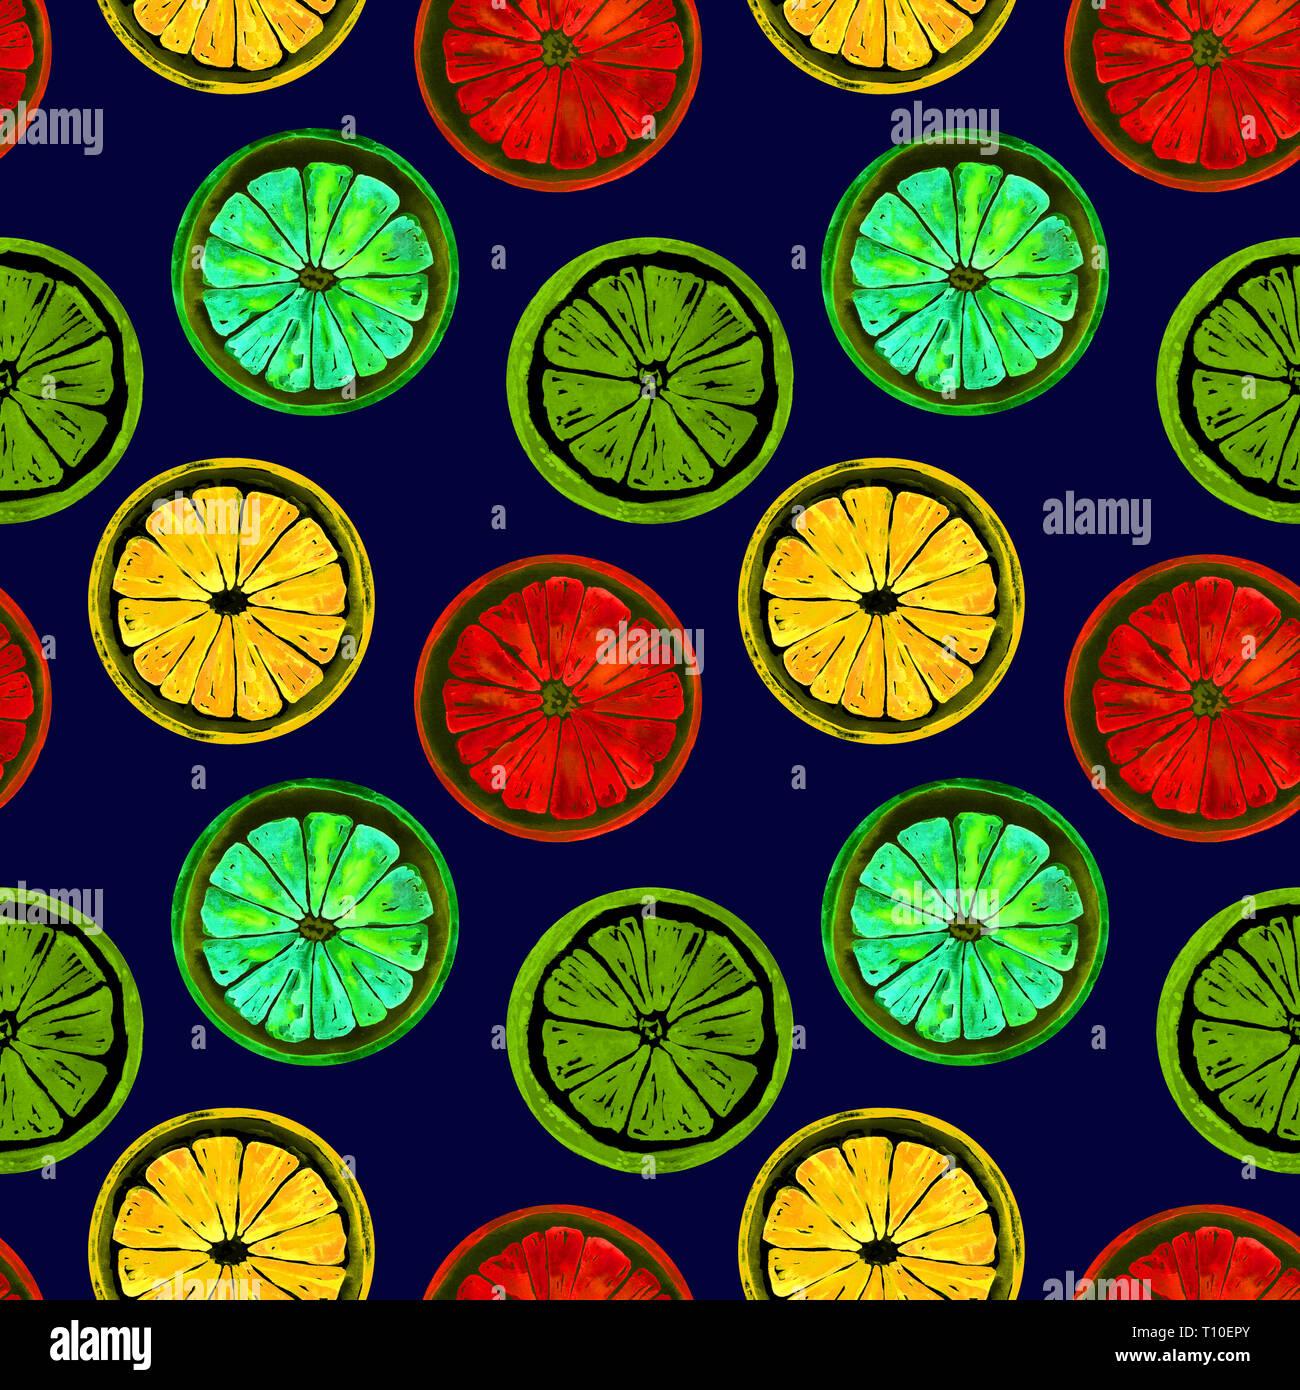 Grapefruit, orange, lime and lemon, bright neon colors palette, seamless pattern design, hand painted watercolor illustration, dark blue background - Stock Image